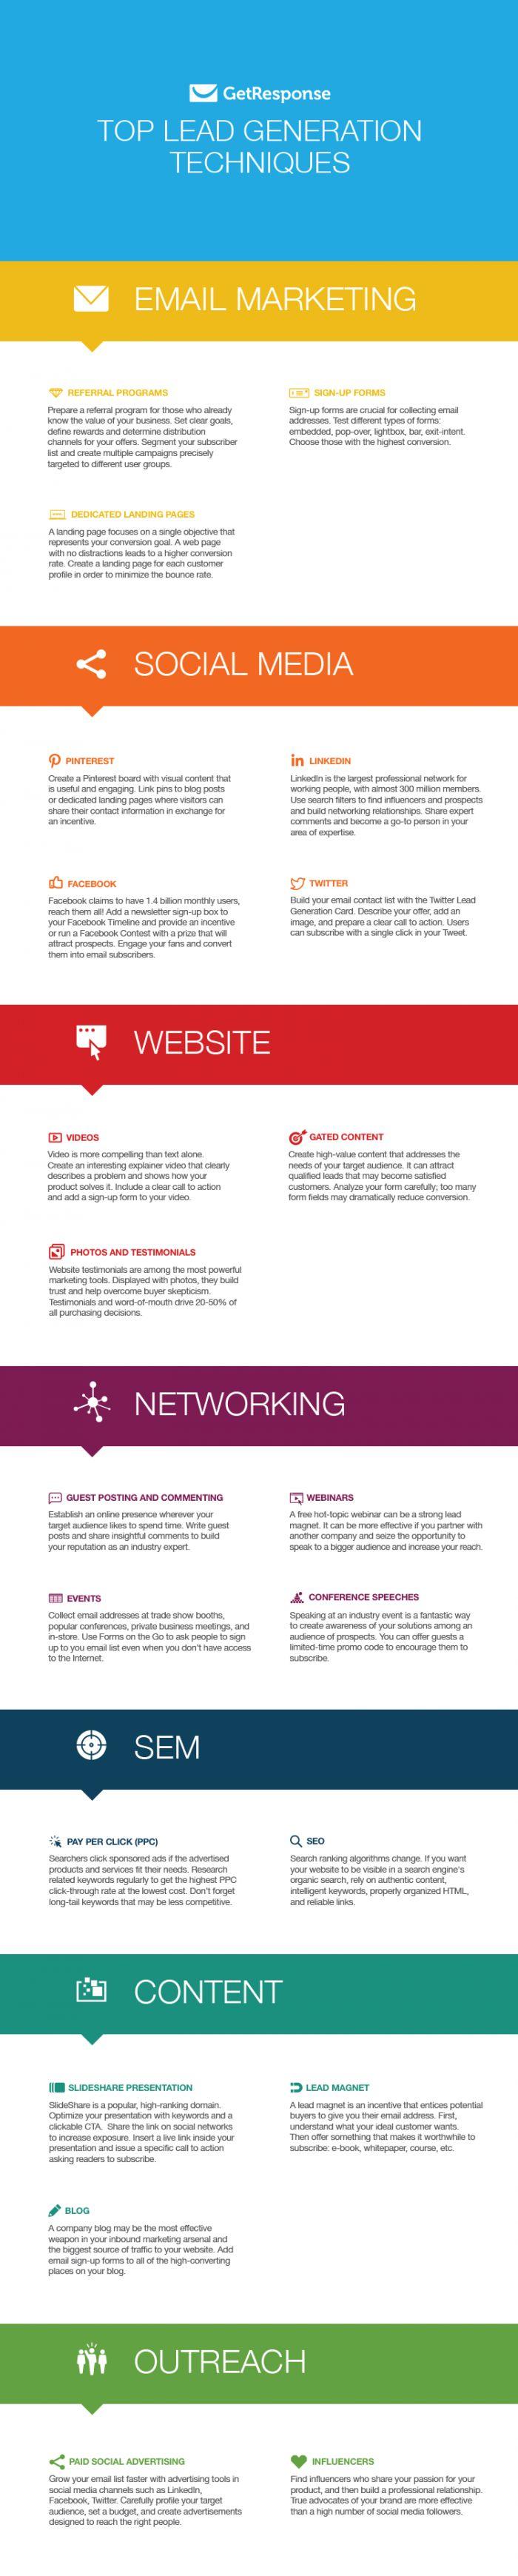 infographic lead generation